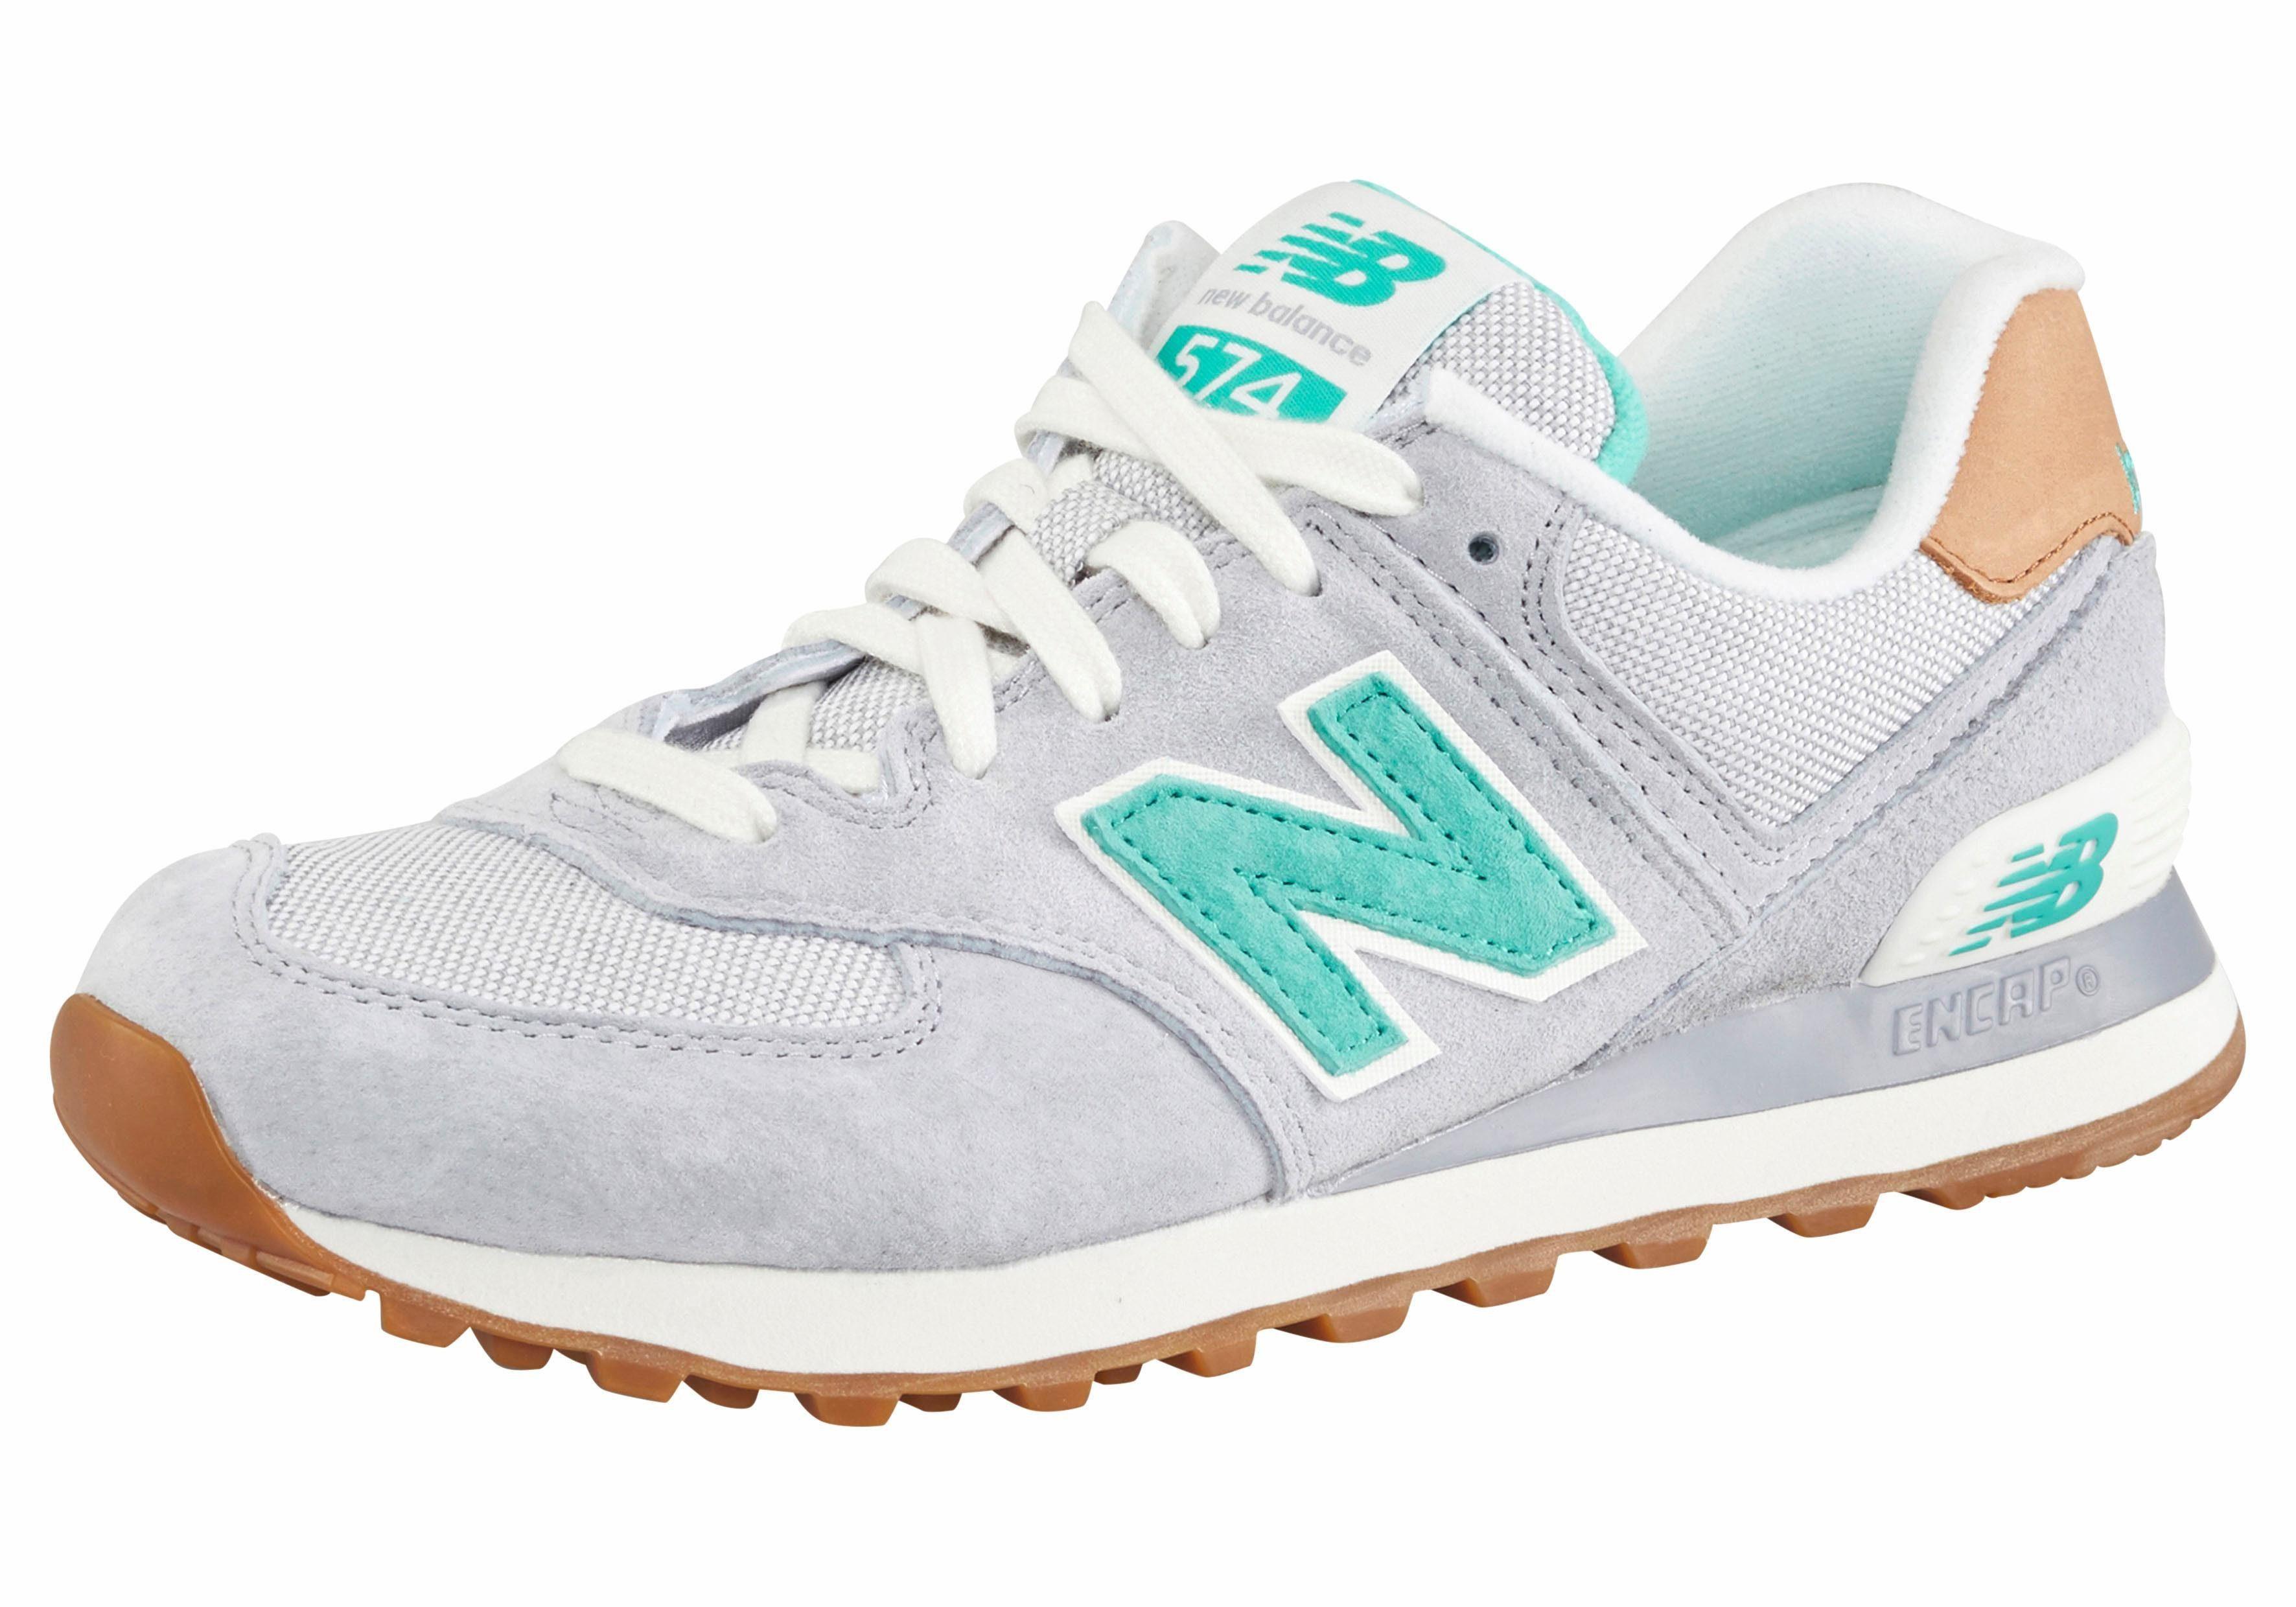 New Balance WL 574 BCB Sneaker online kaufen  grau-grün